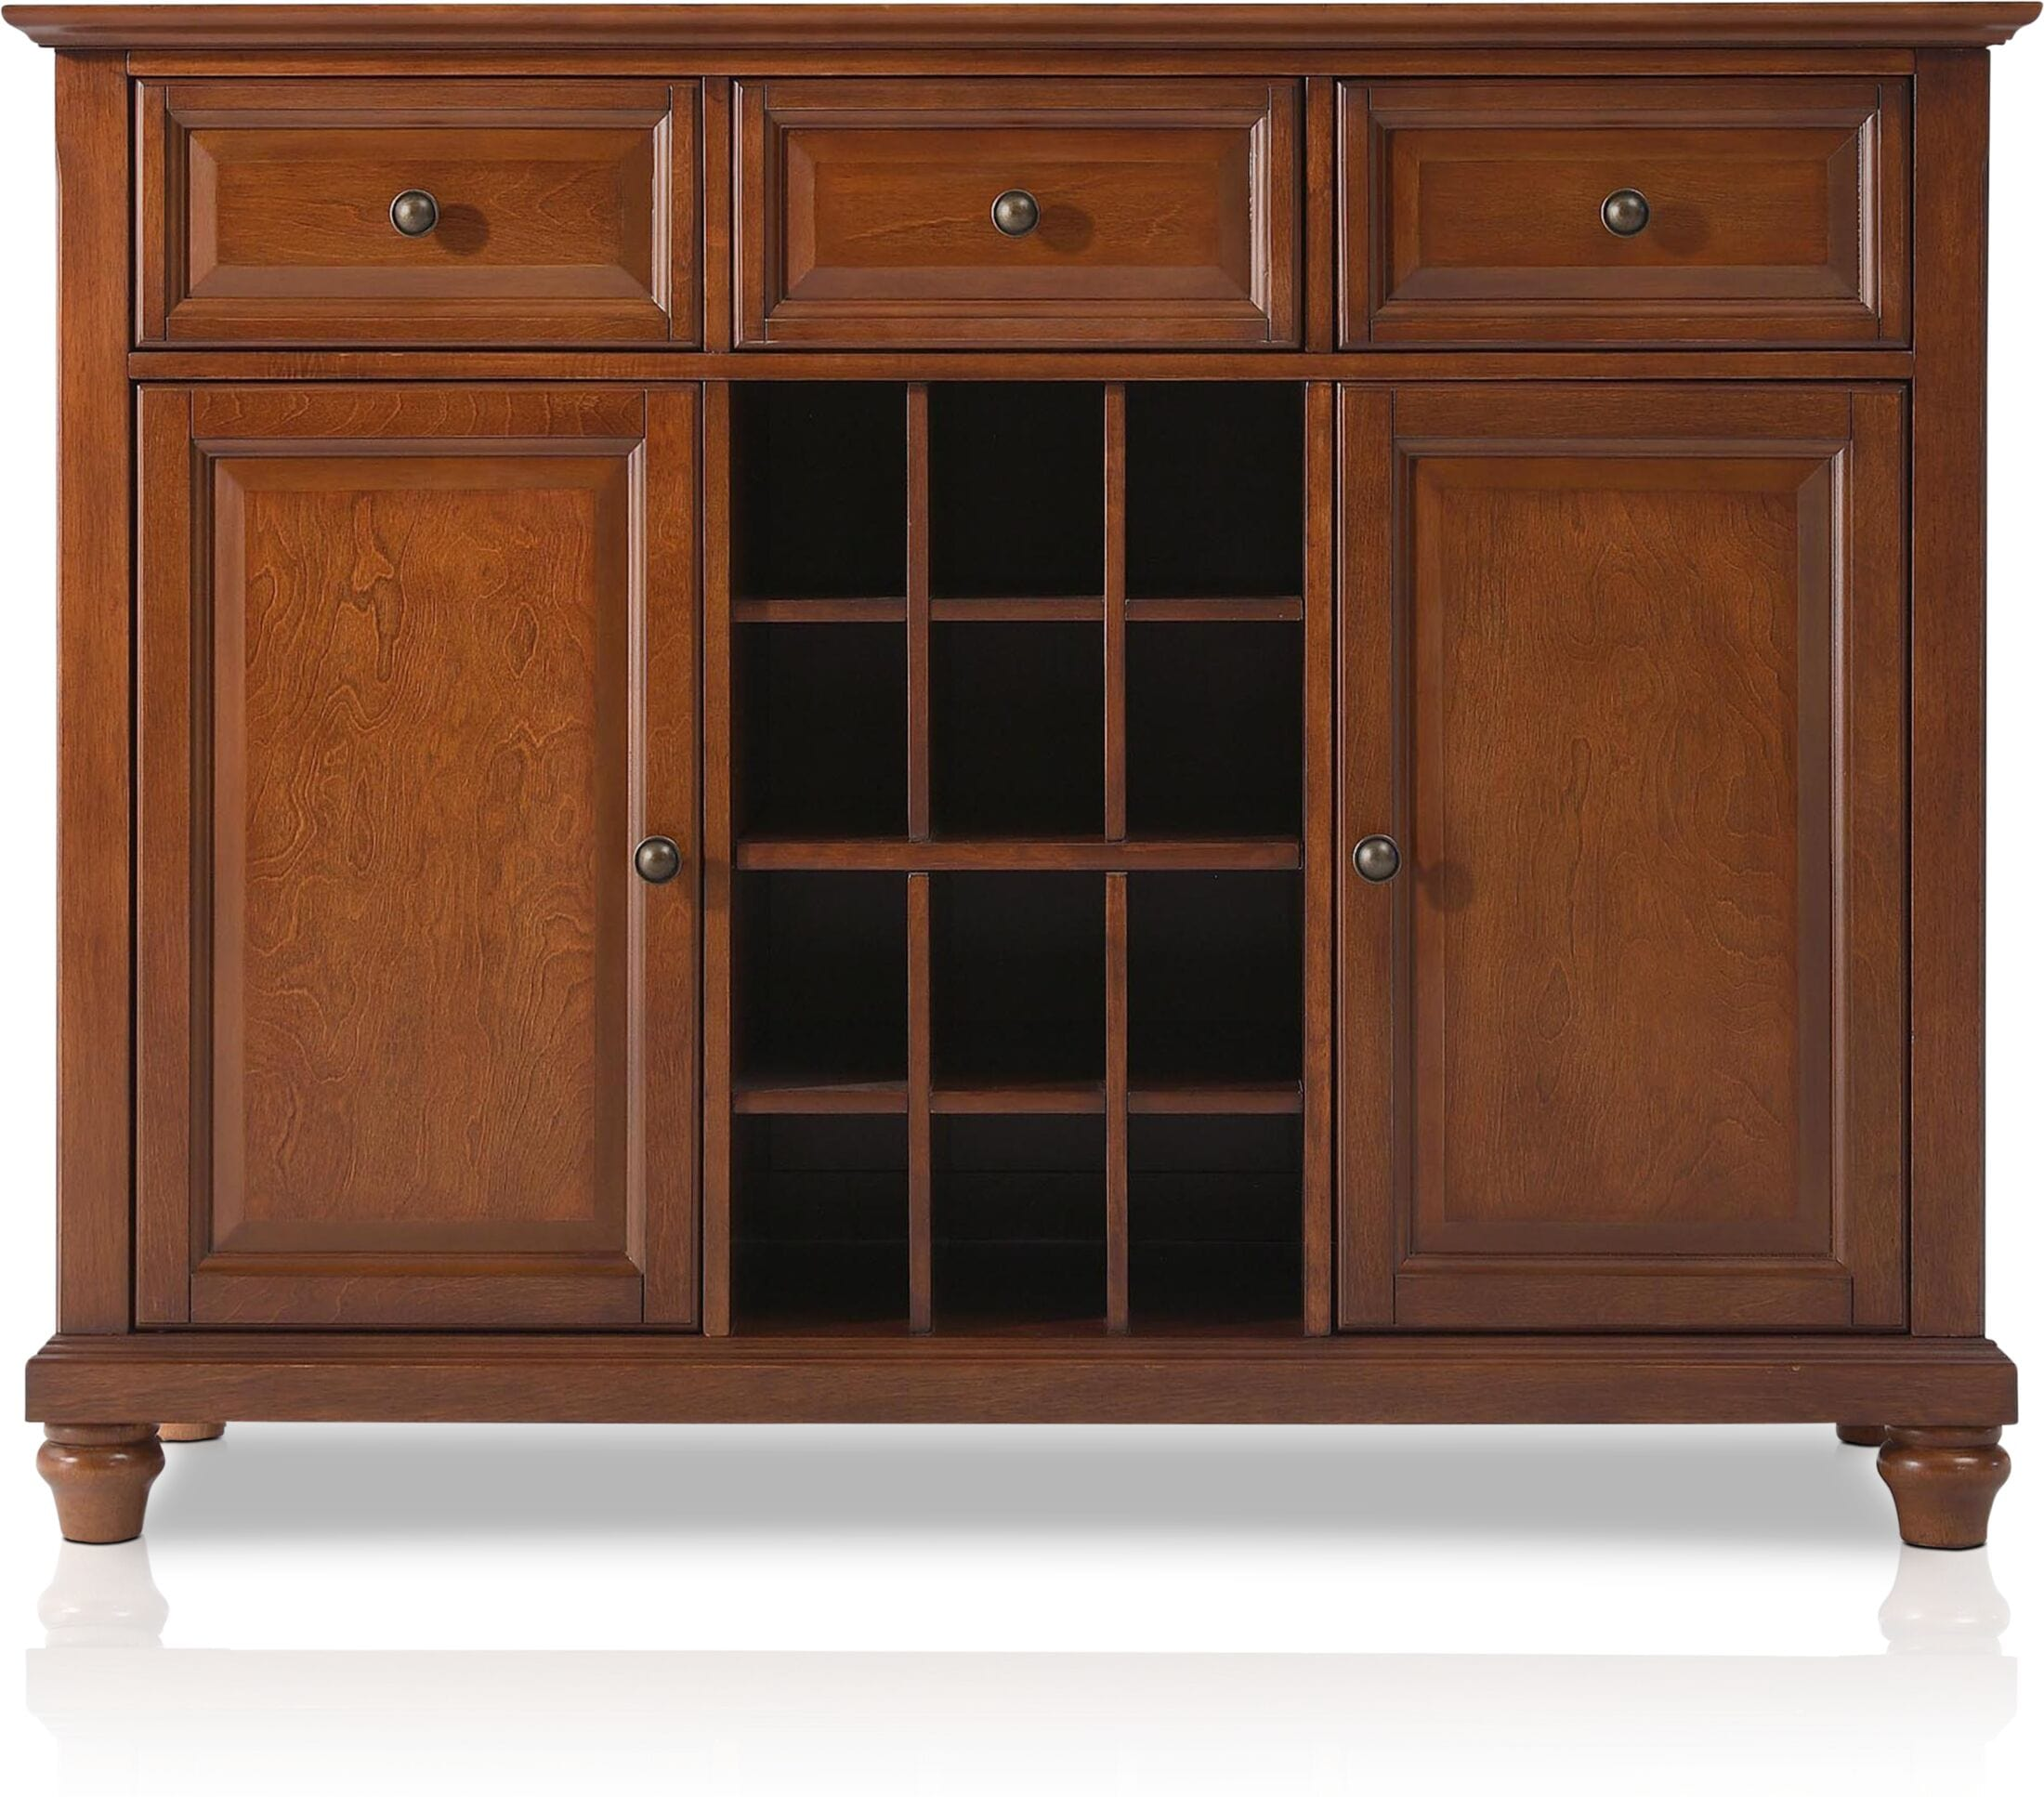 Dining Room Furniture - Viva Buffet